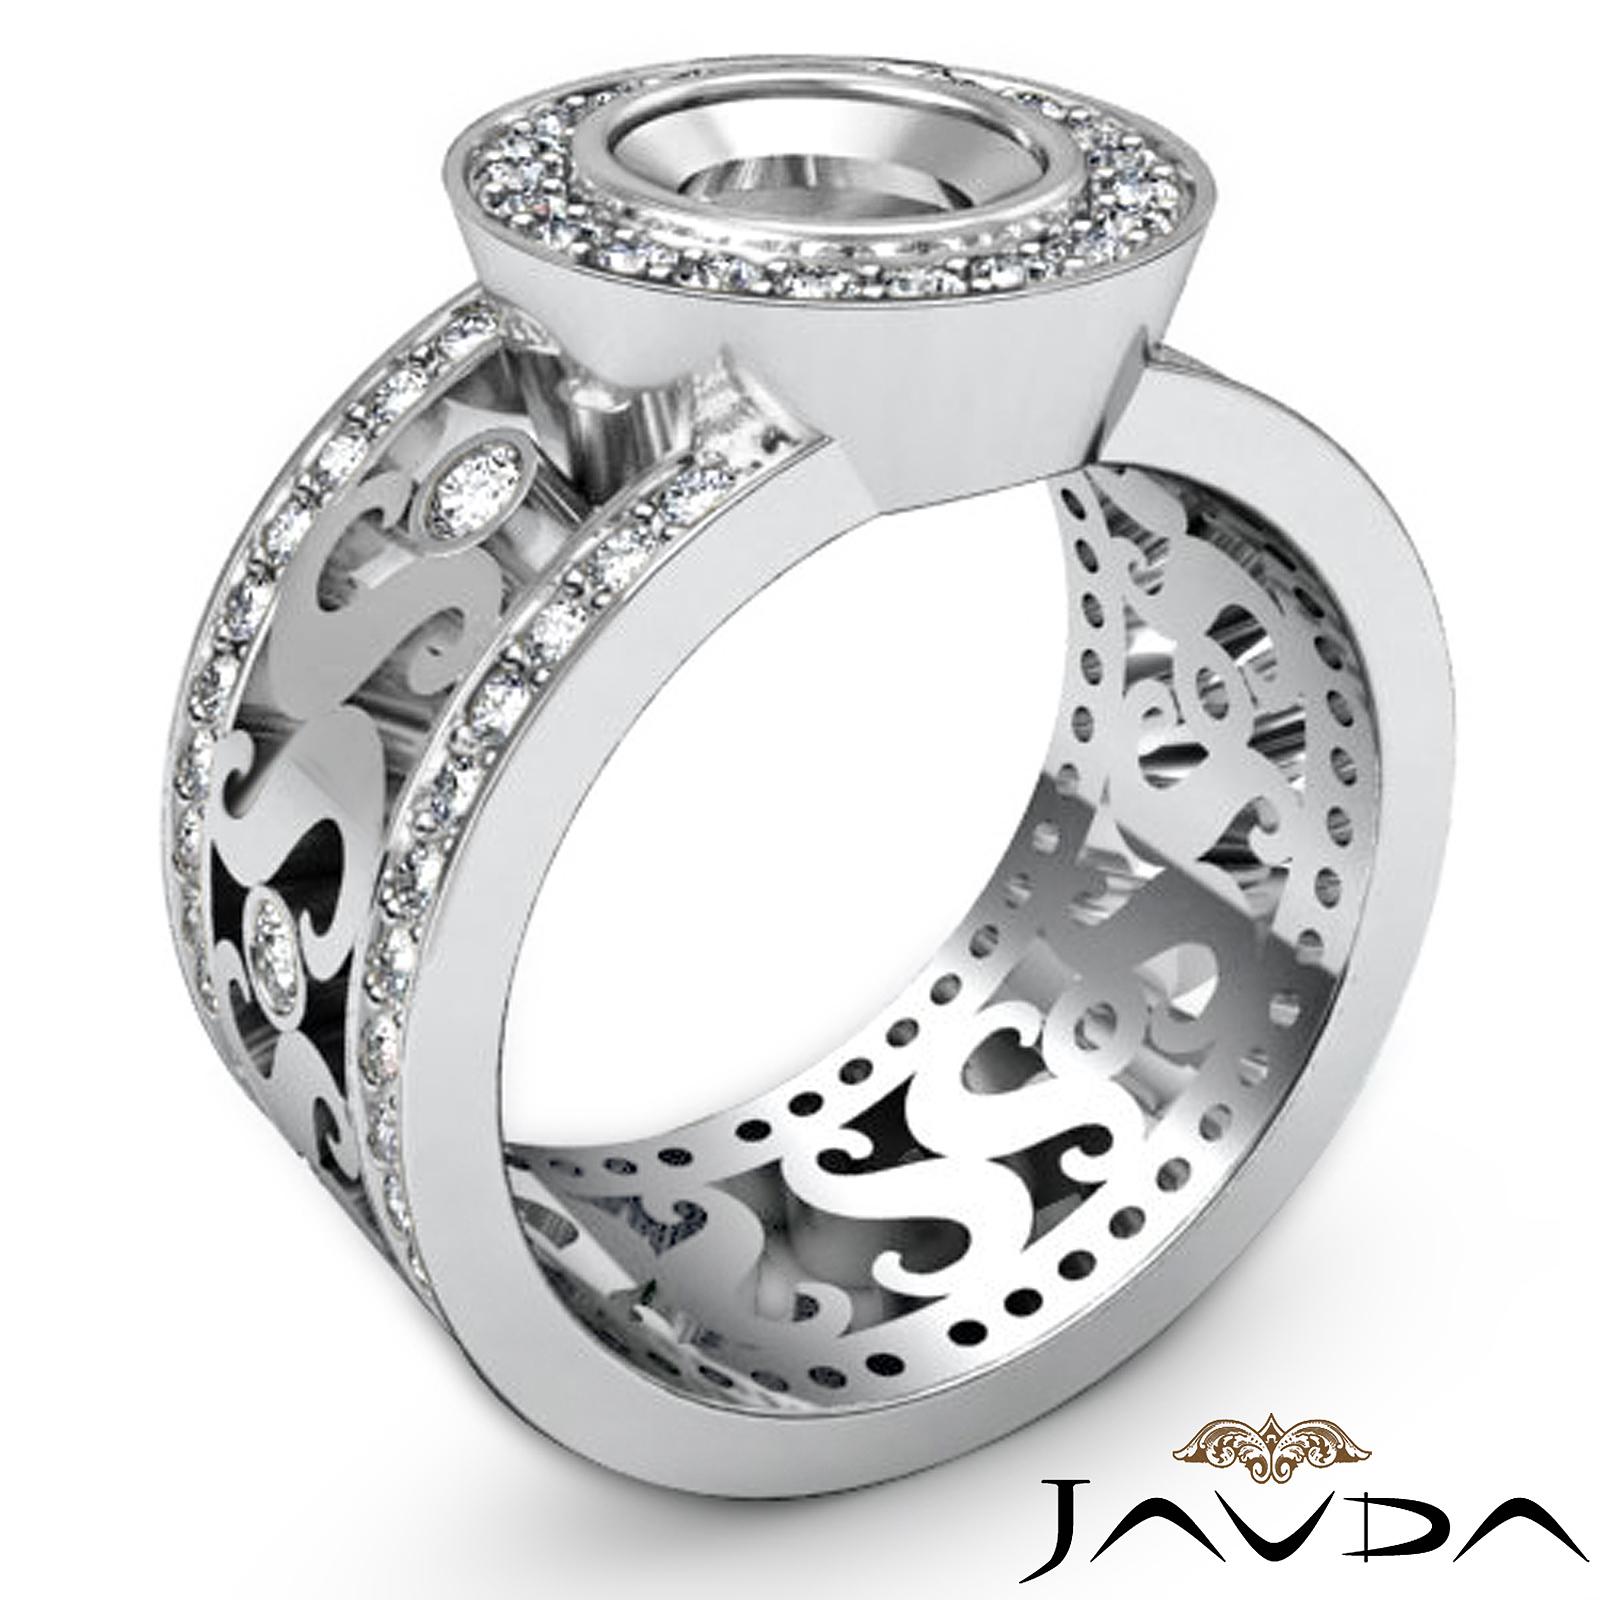 diamond antique engagement halo setting ring oval semi. Black Bedroom Furniture Sets. Home Design Ideas